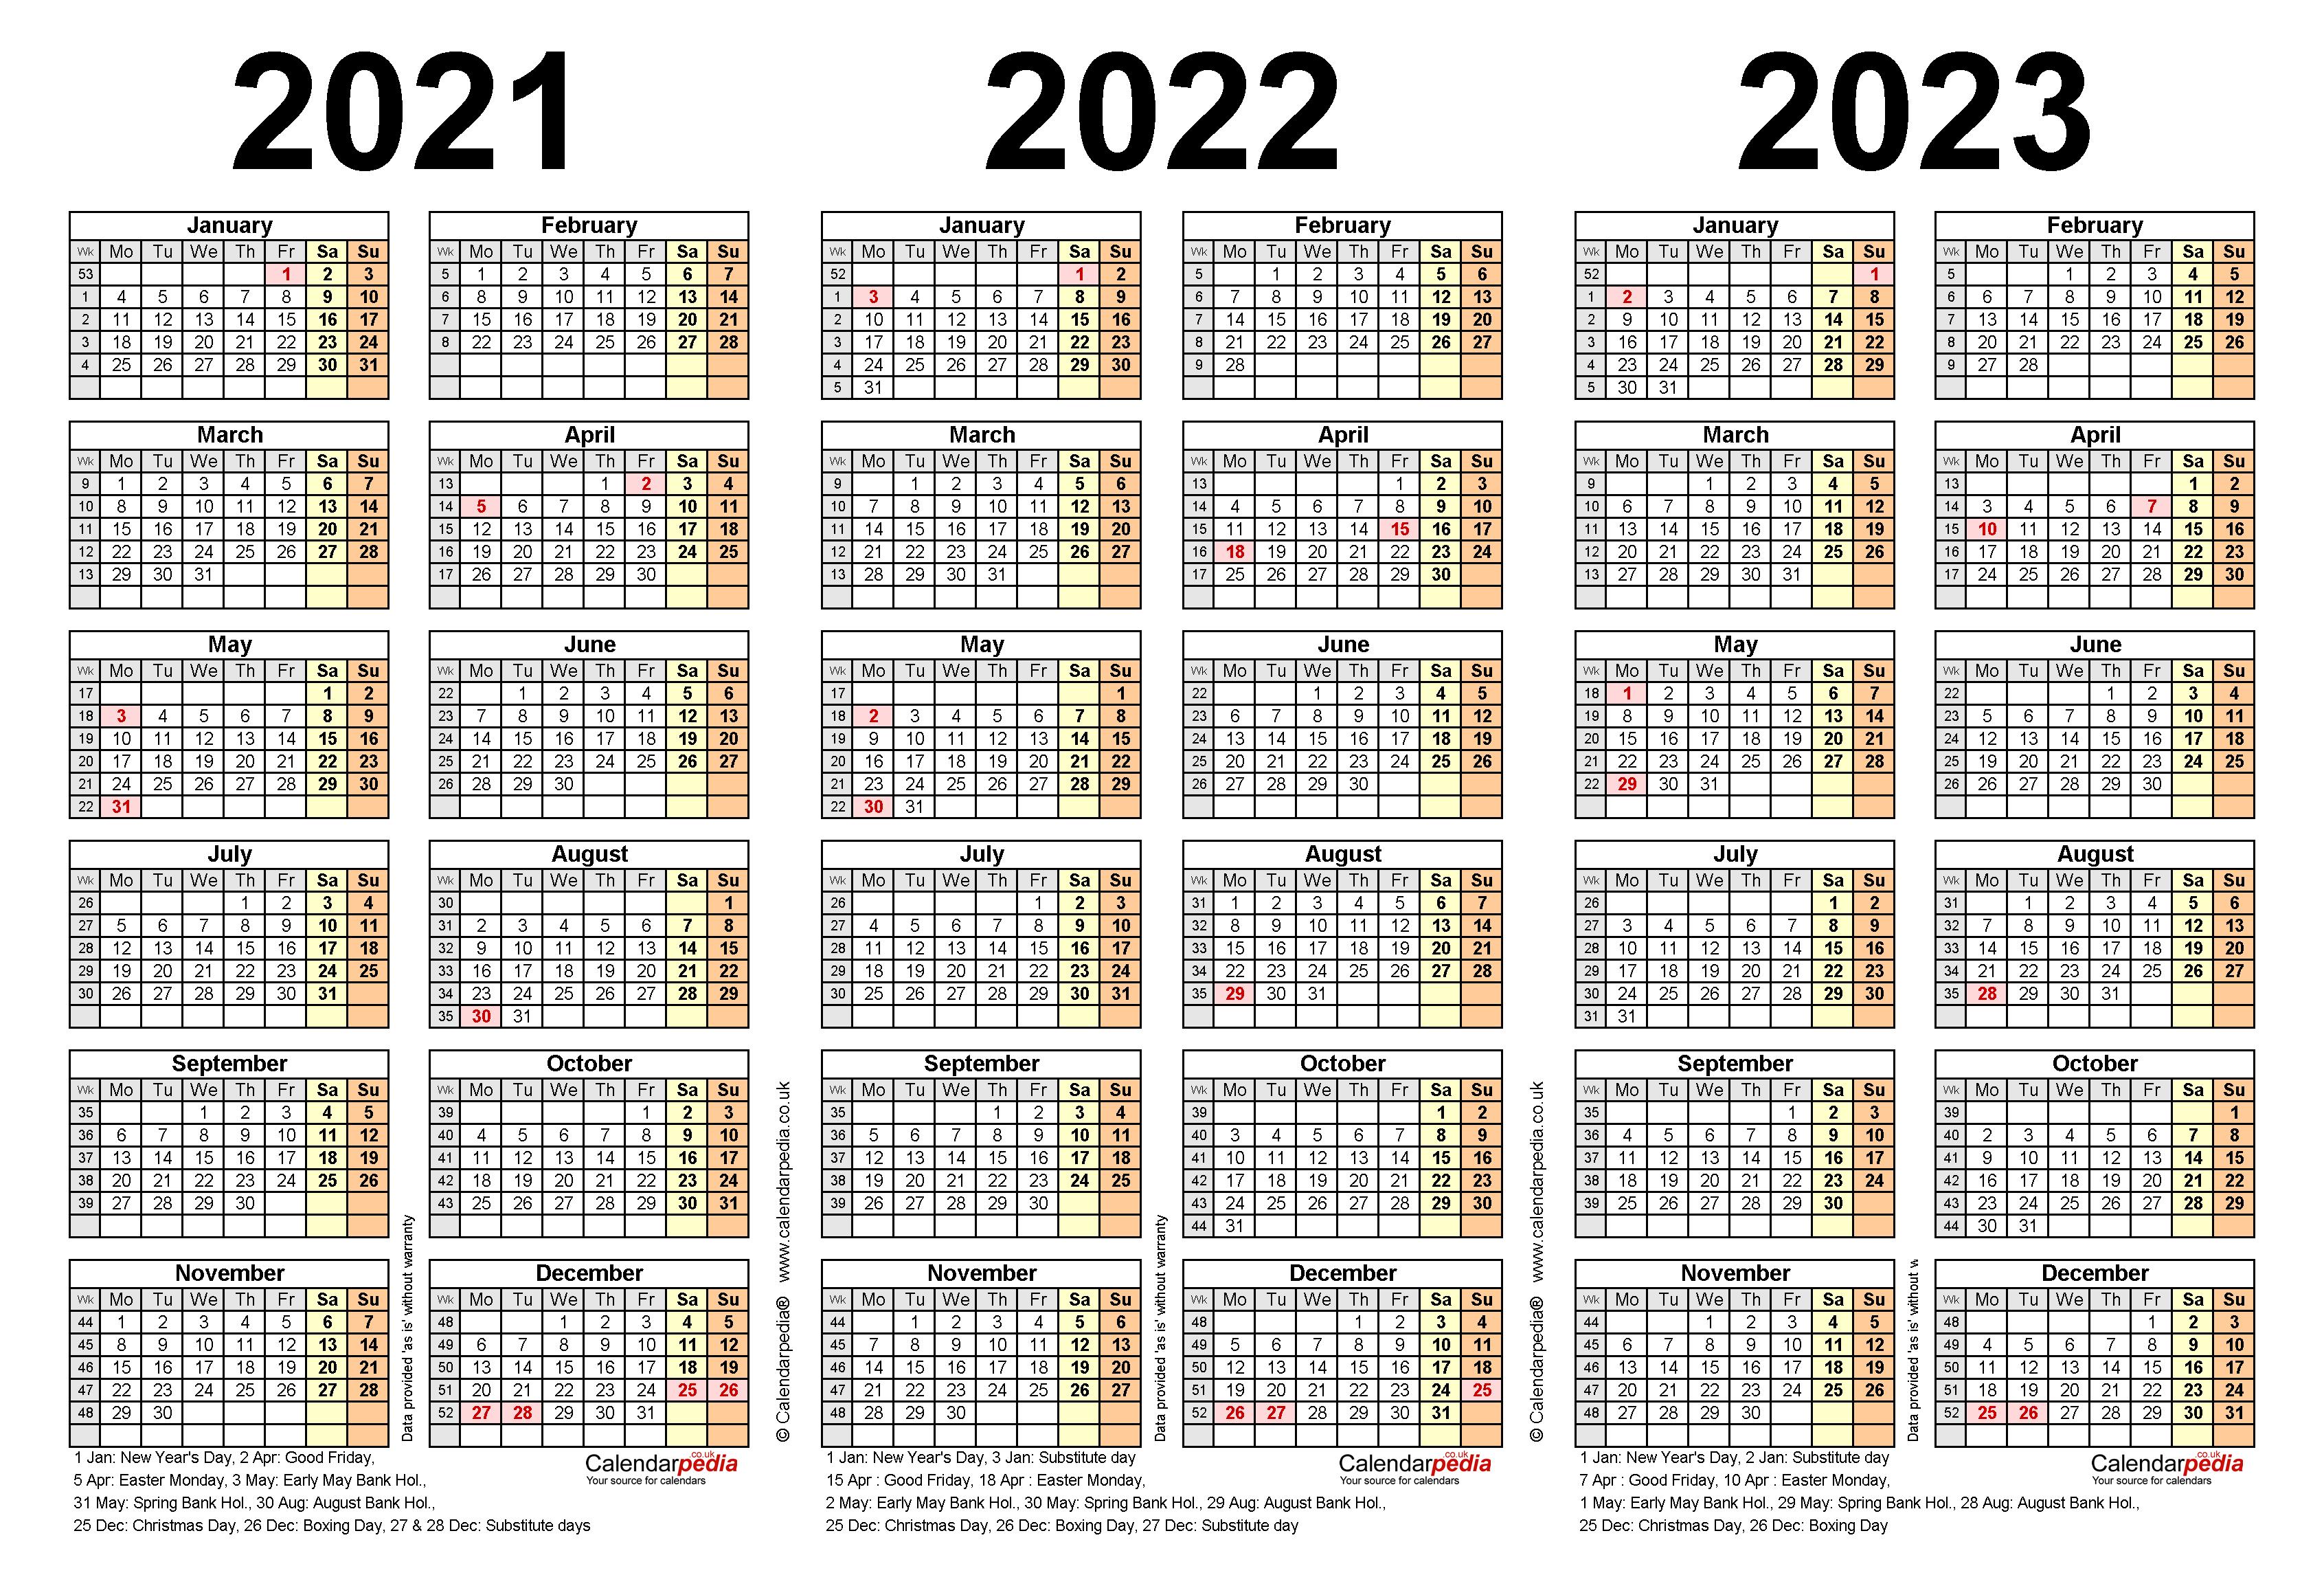 Purdue Calendar 2021 2021 Printable Calendars